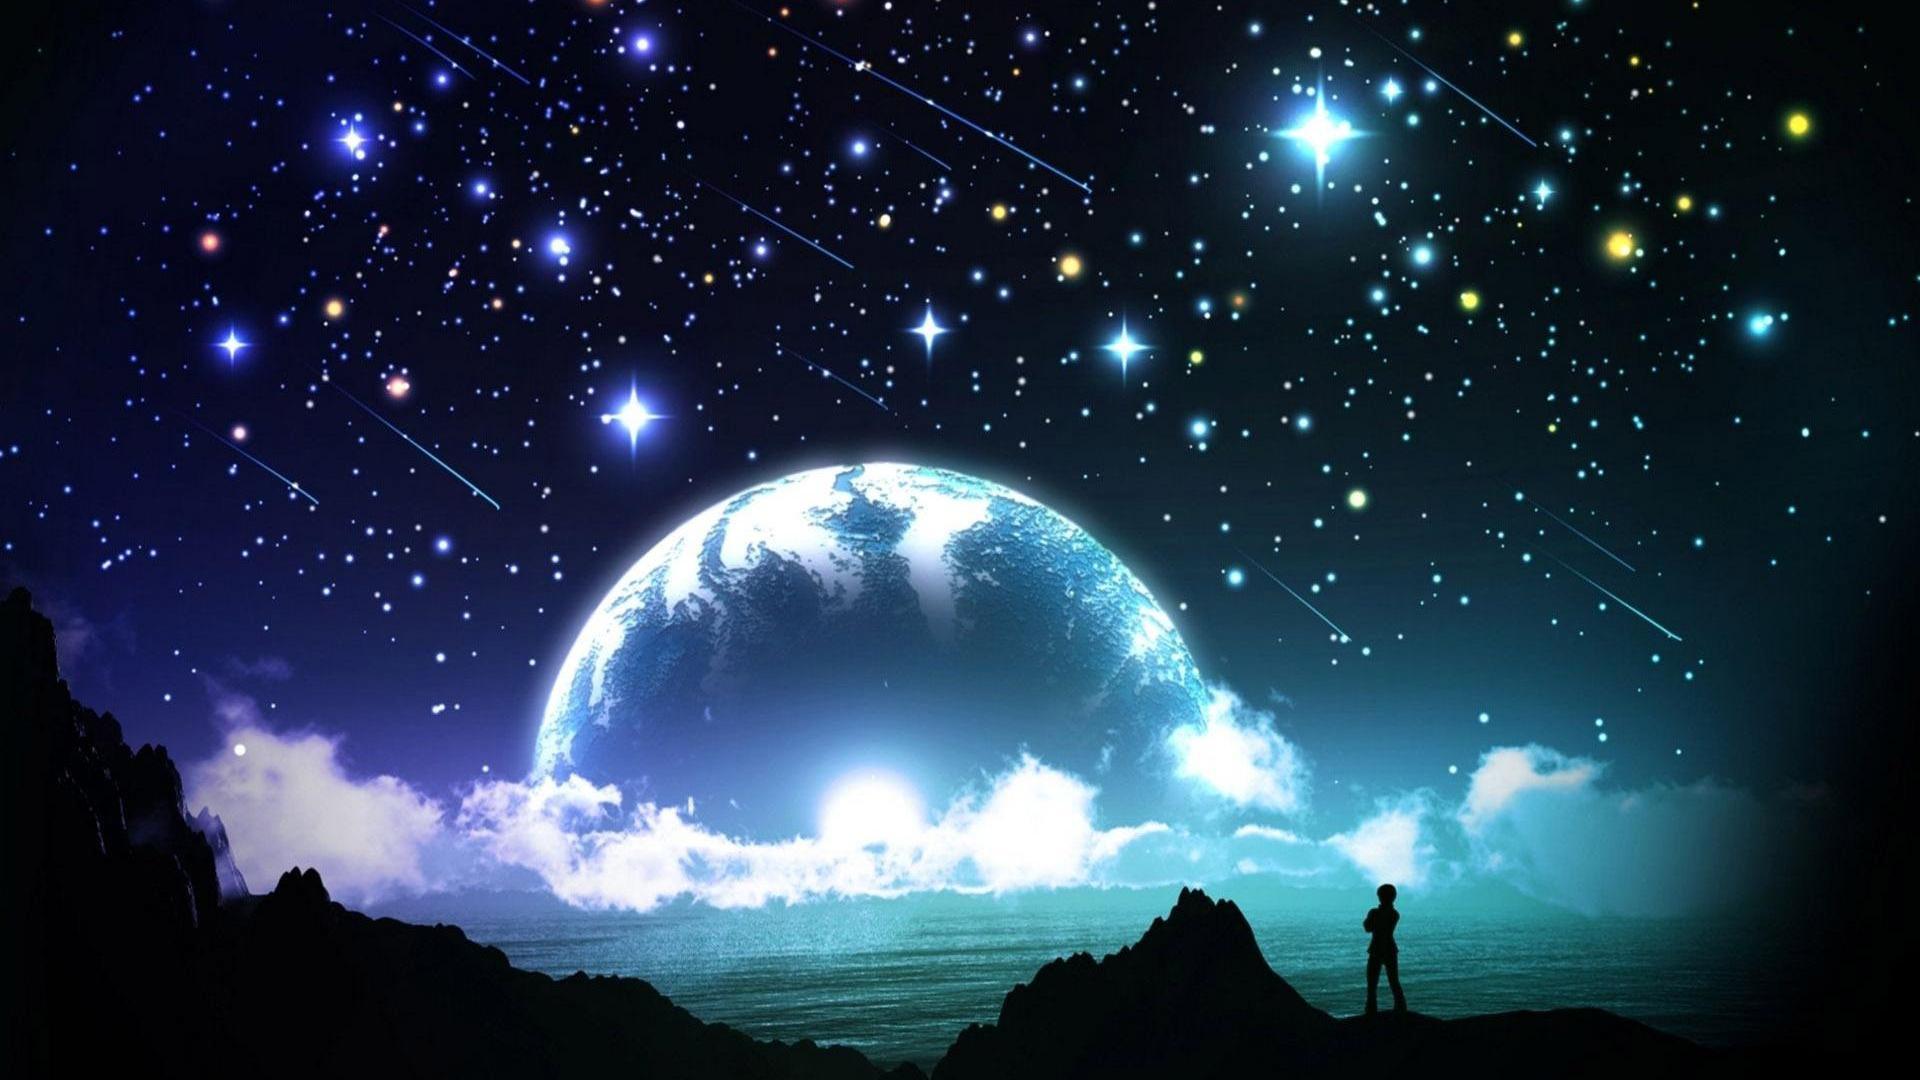 1920x1080-bright_night_sky_ocean_cloud_fantasy_sky_sea_star_moon_night-1403